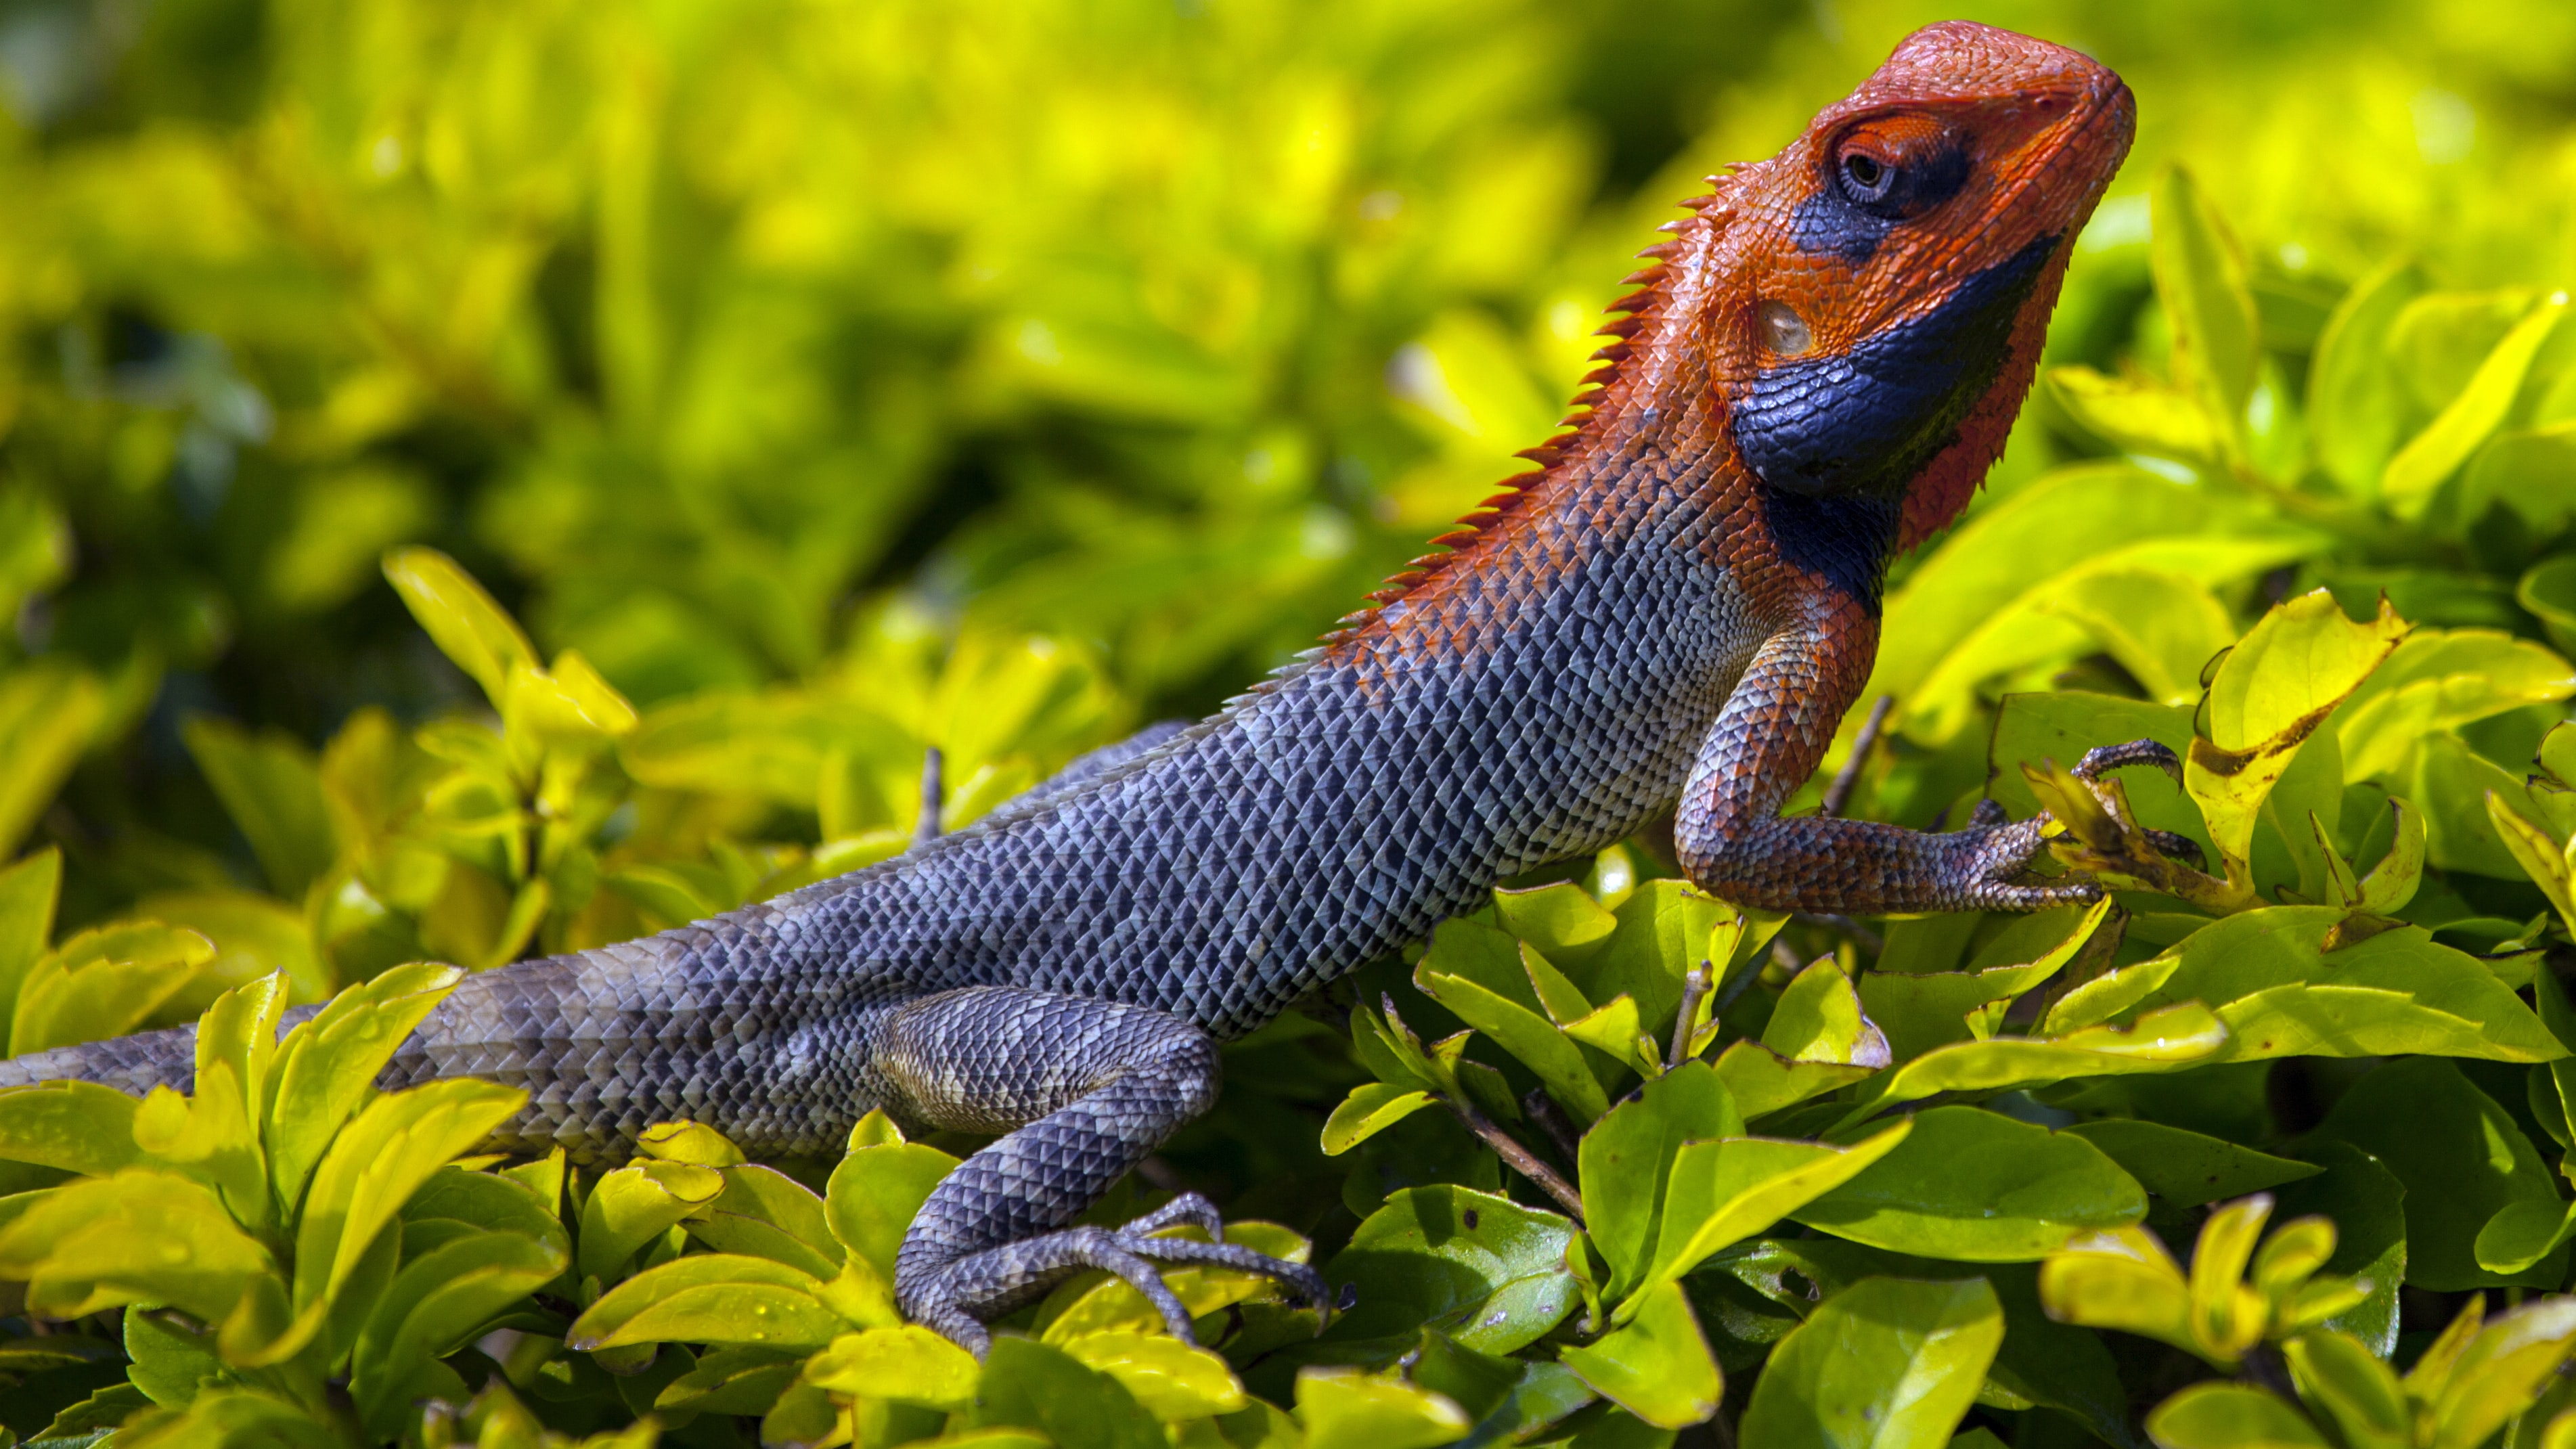 orange and gray Iguana standing on plant